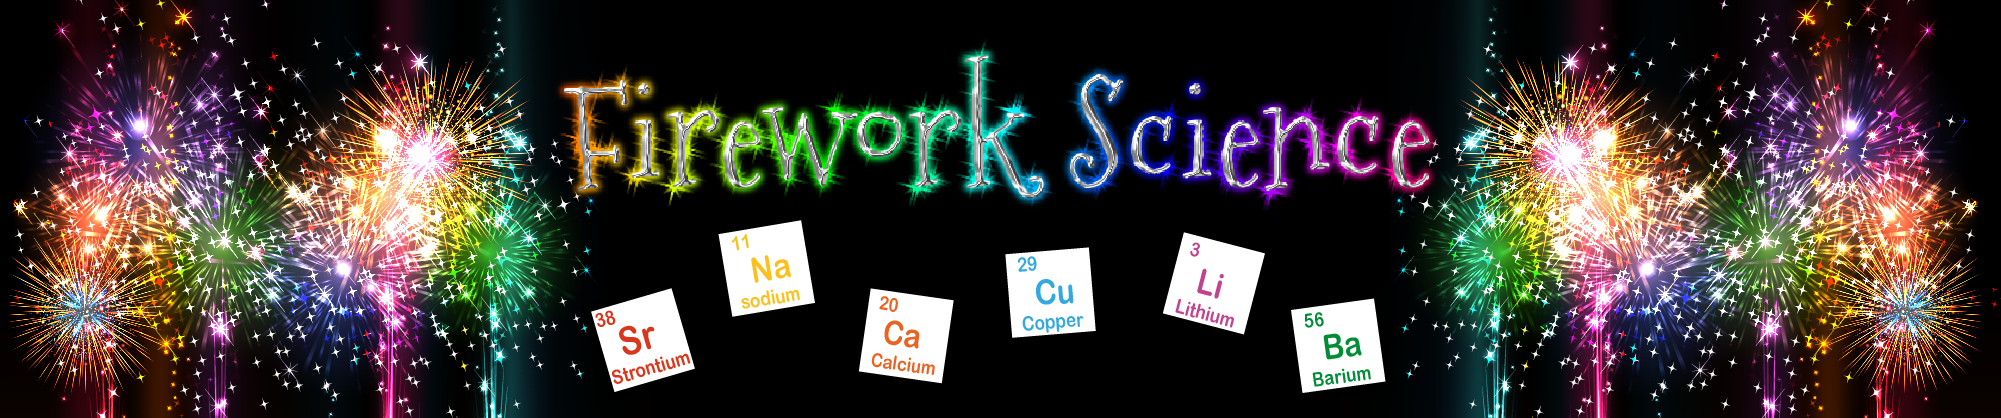 Firework science October activity camp 2021